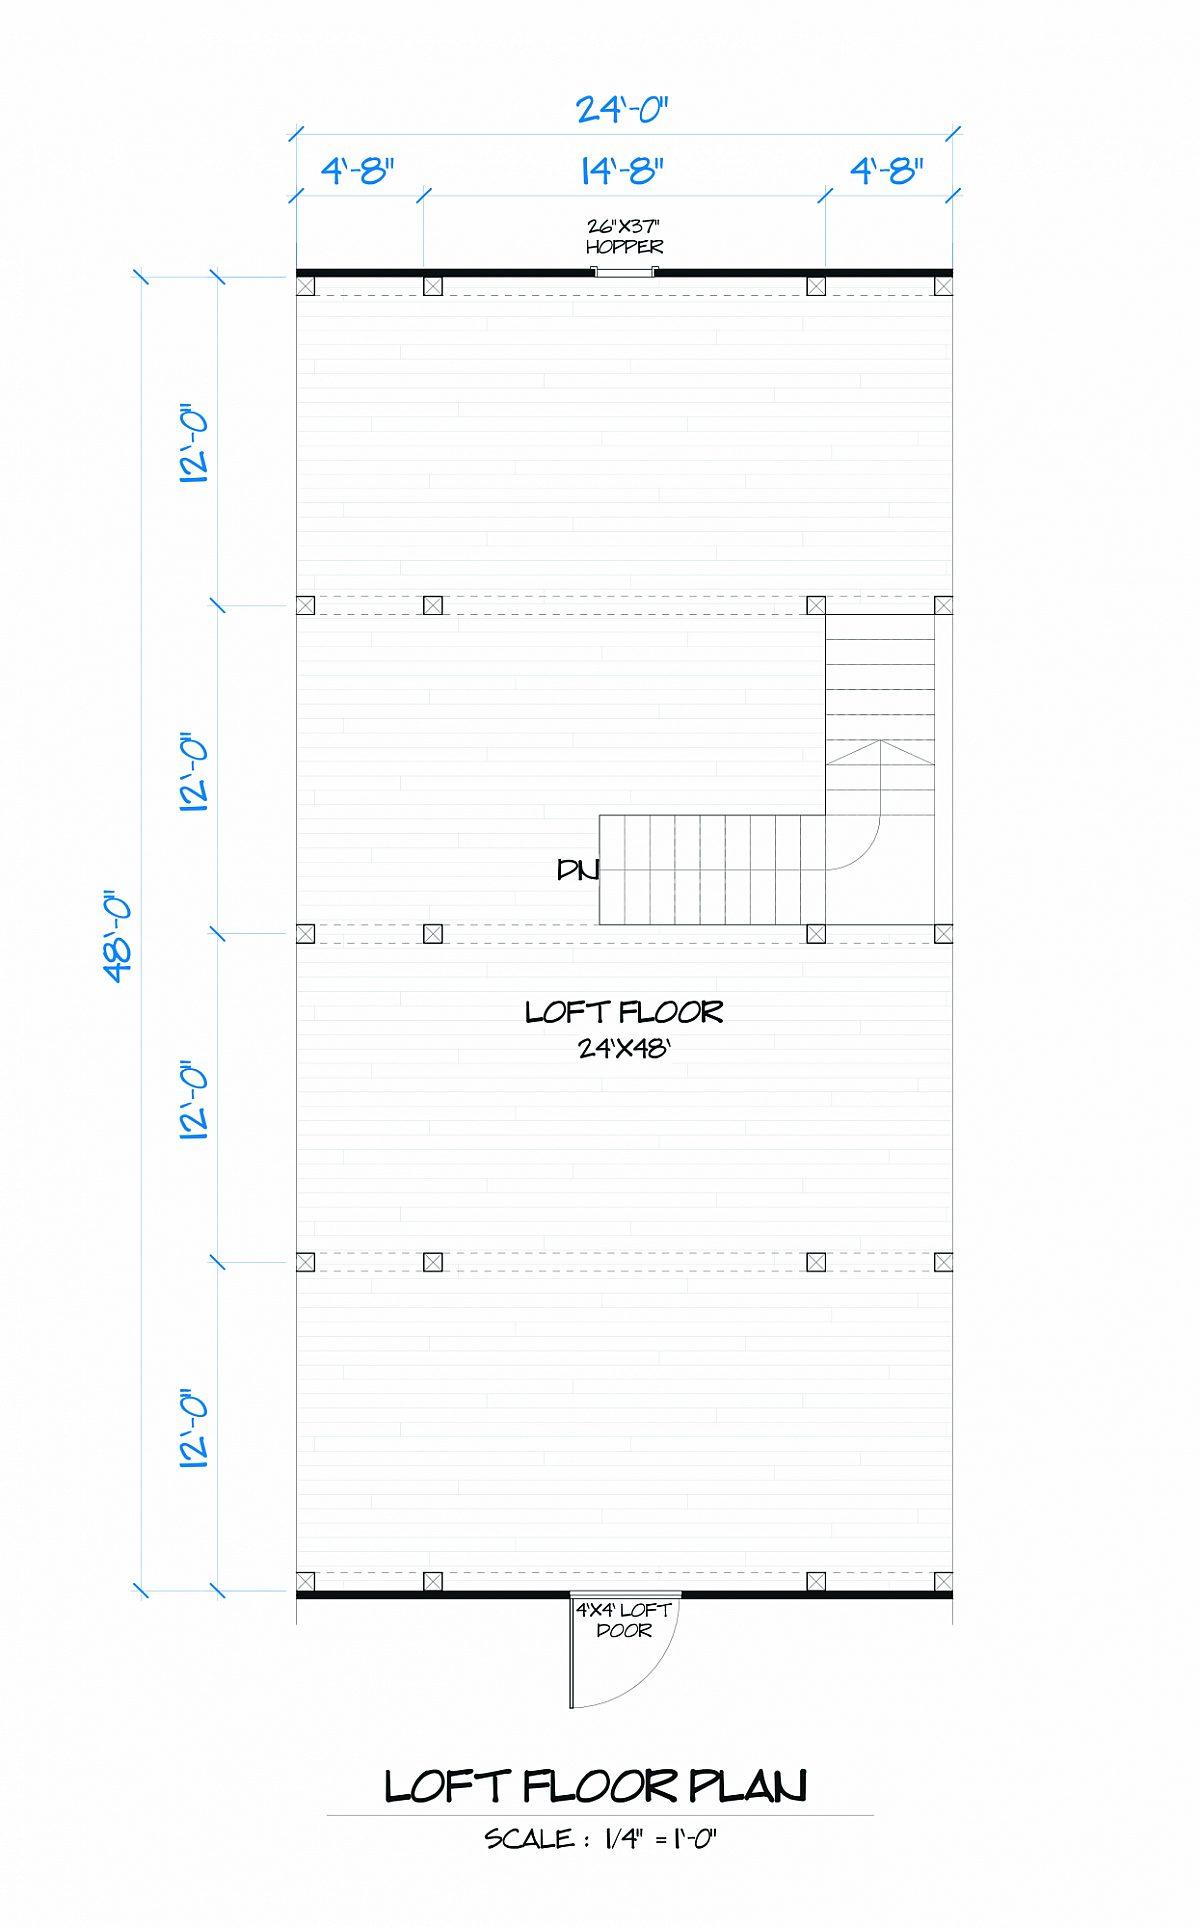 Timberlyne Lotus Barn Loft Floor Plan